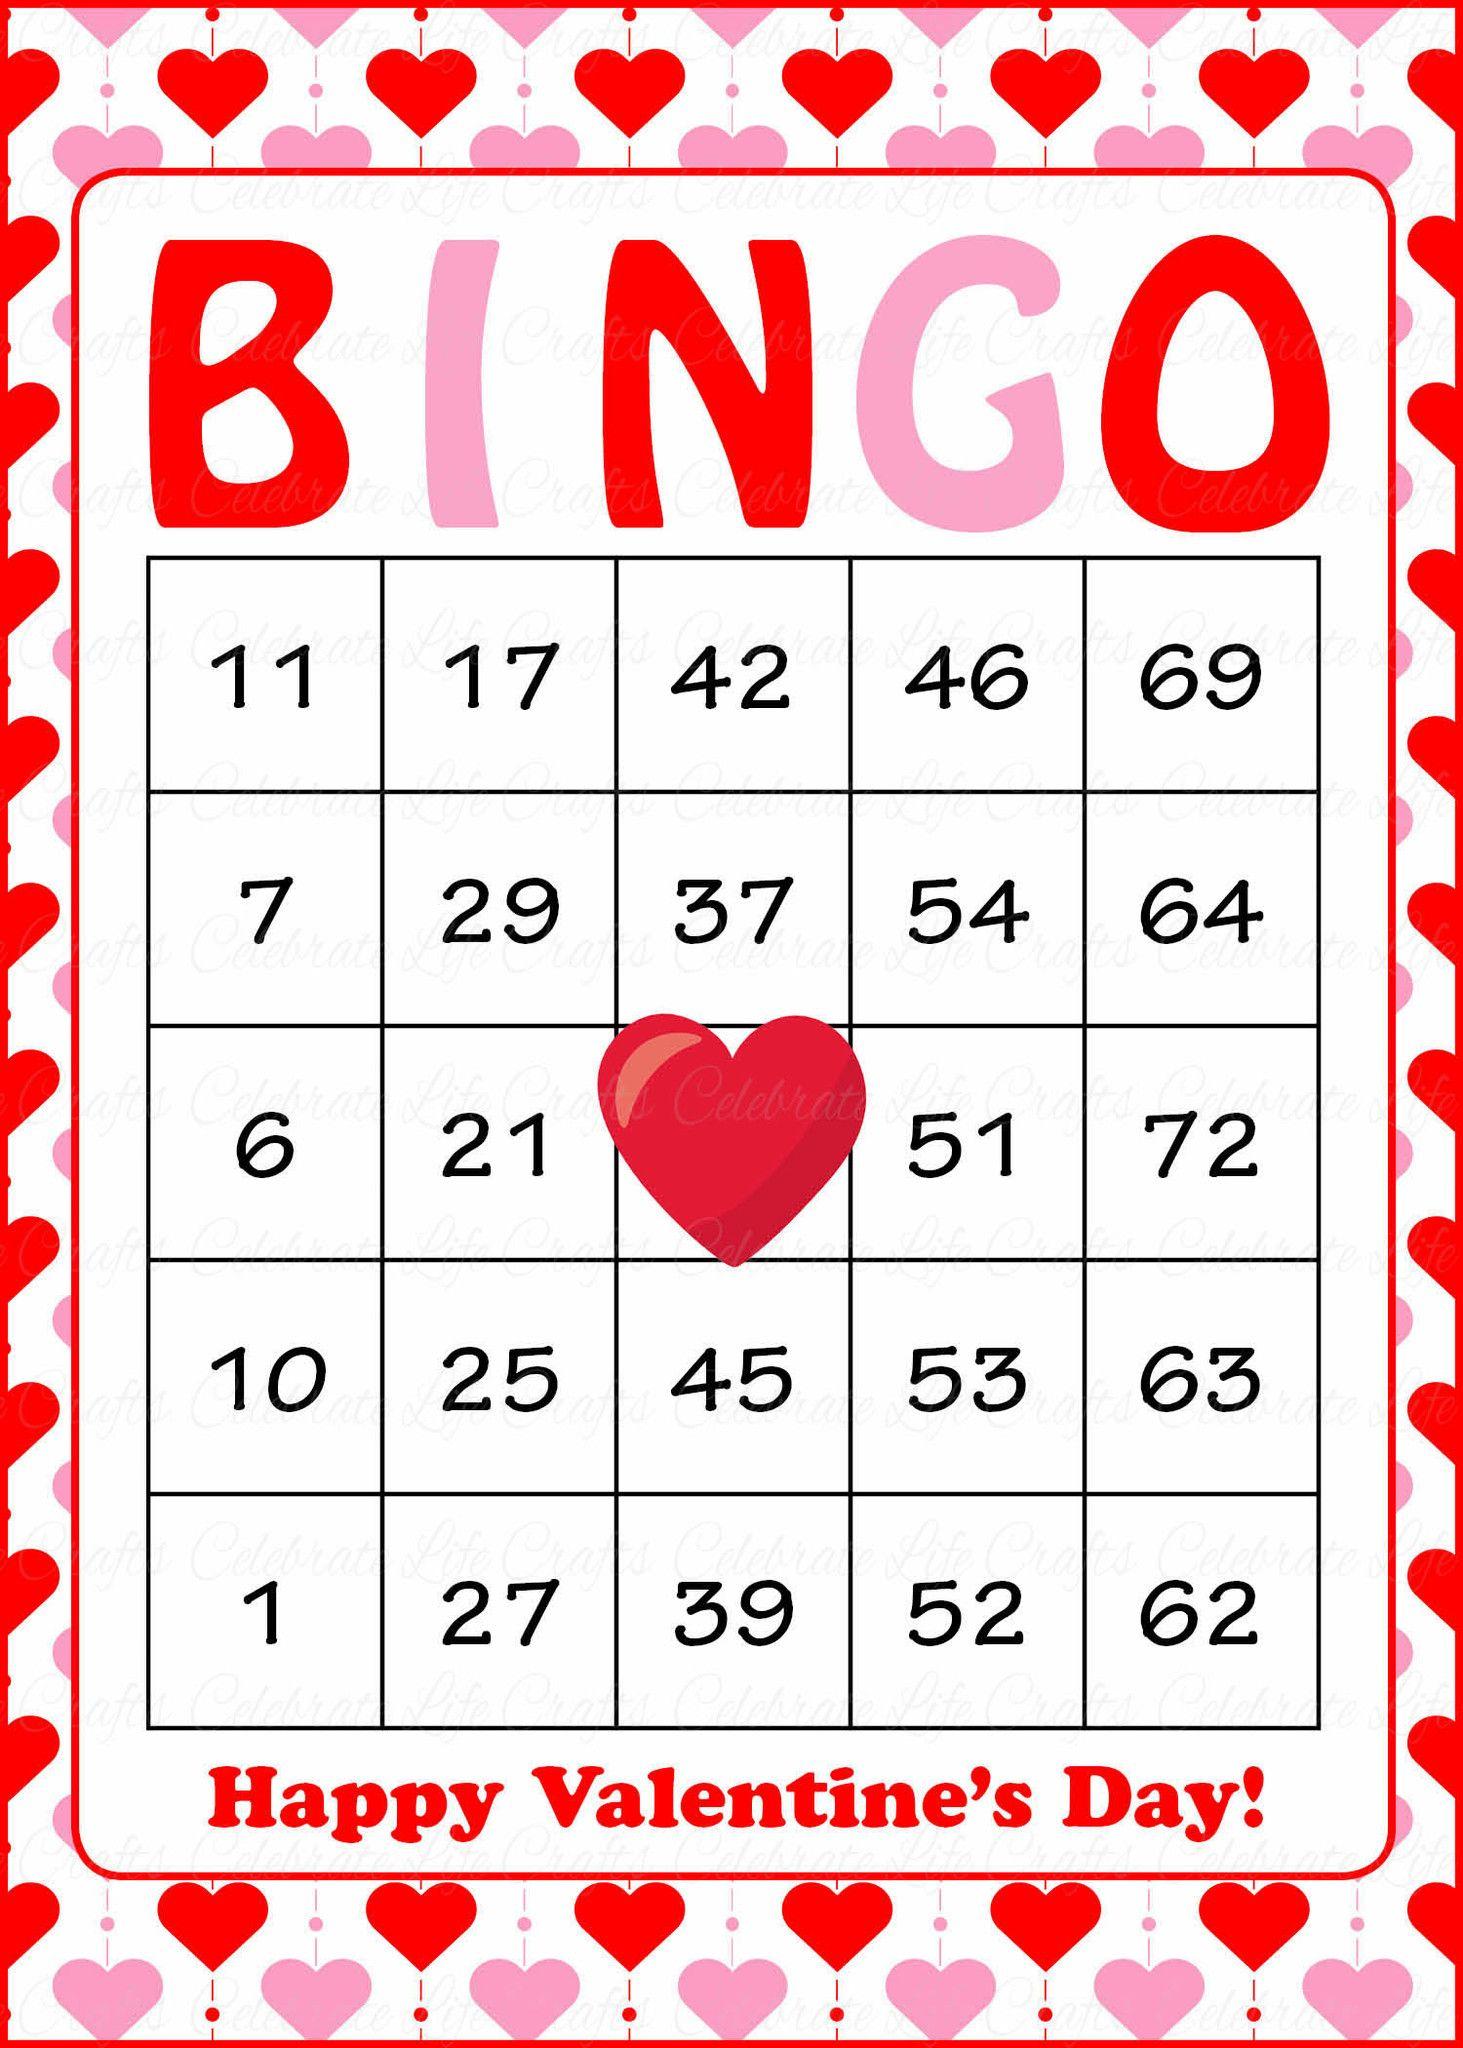 Valentine's Bingo Cards - Printable Download - Prefilled